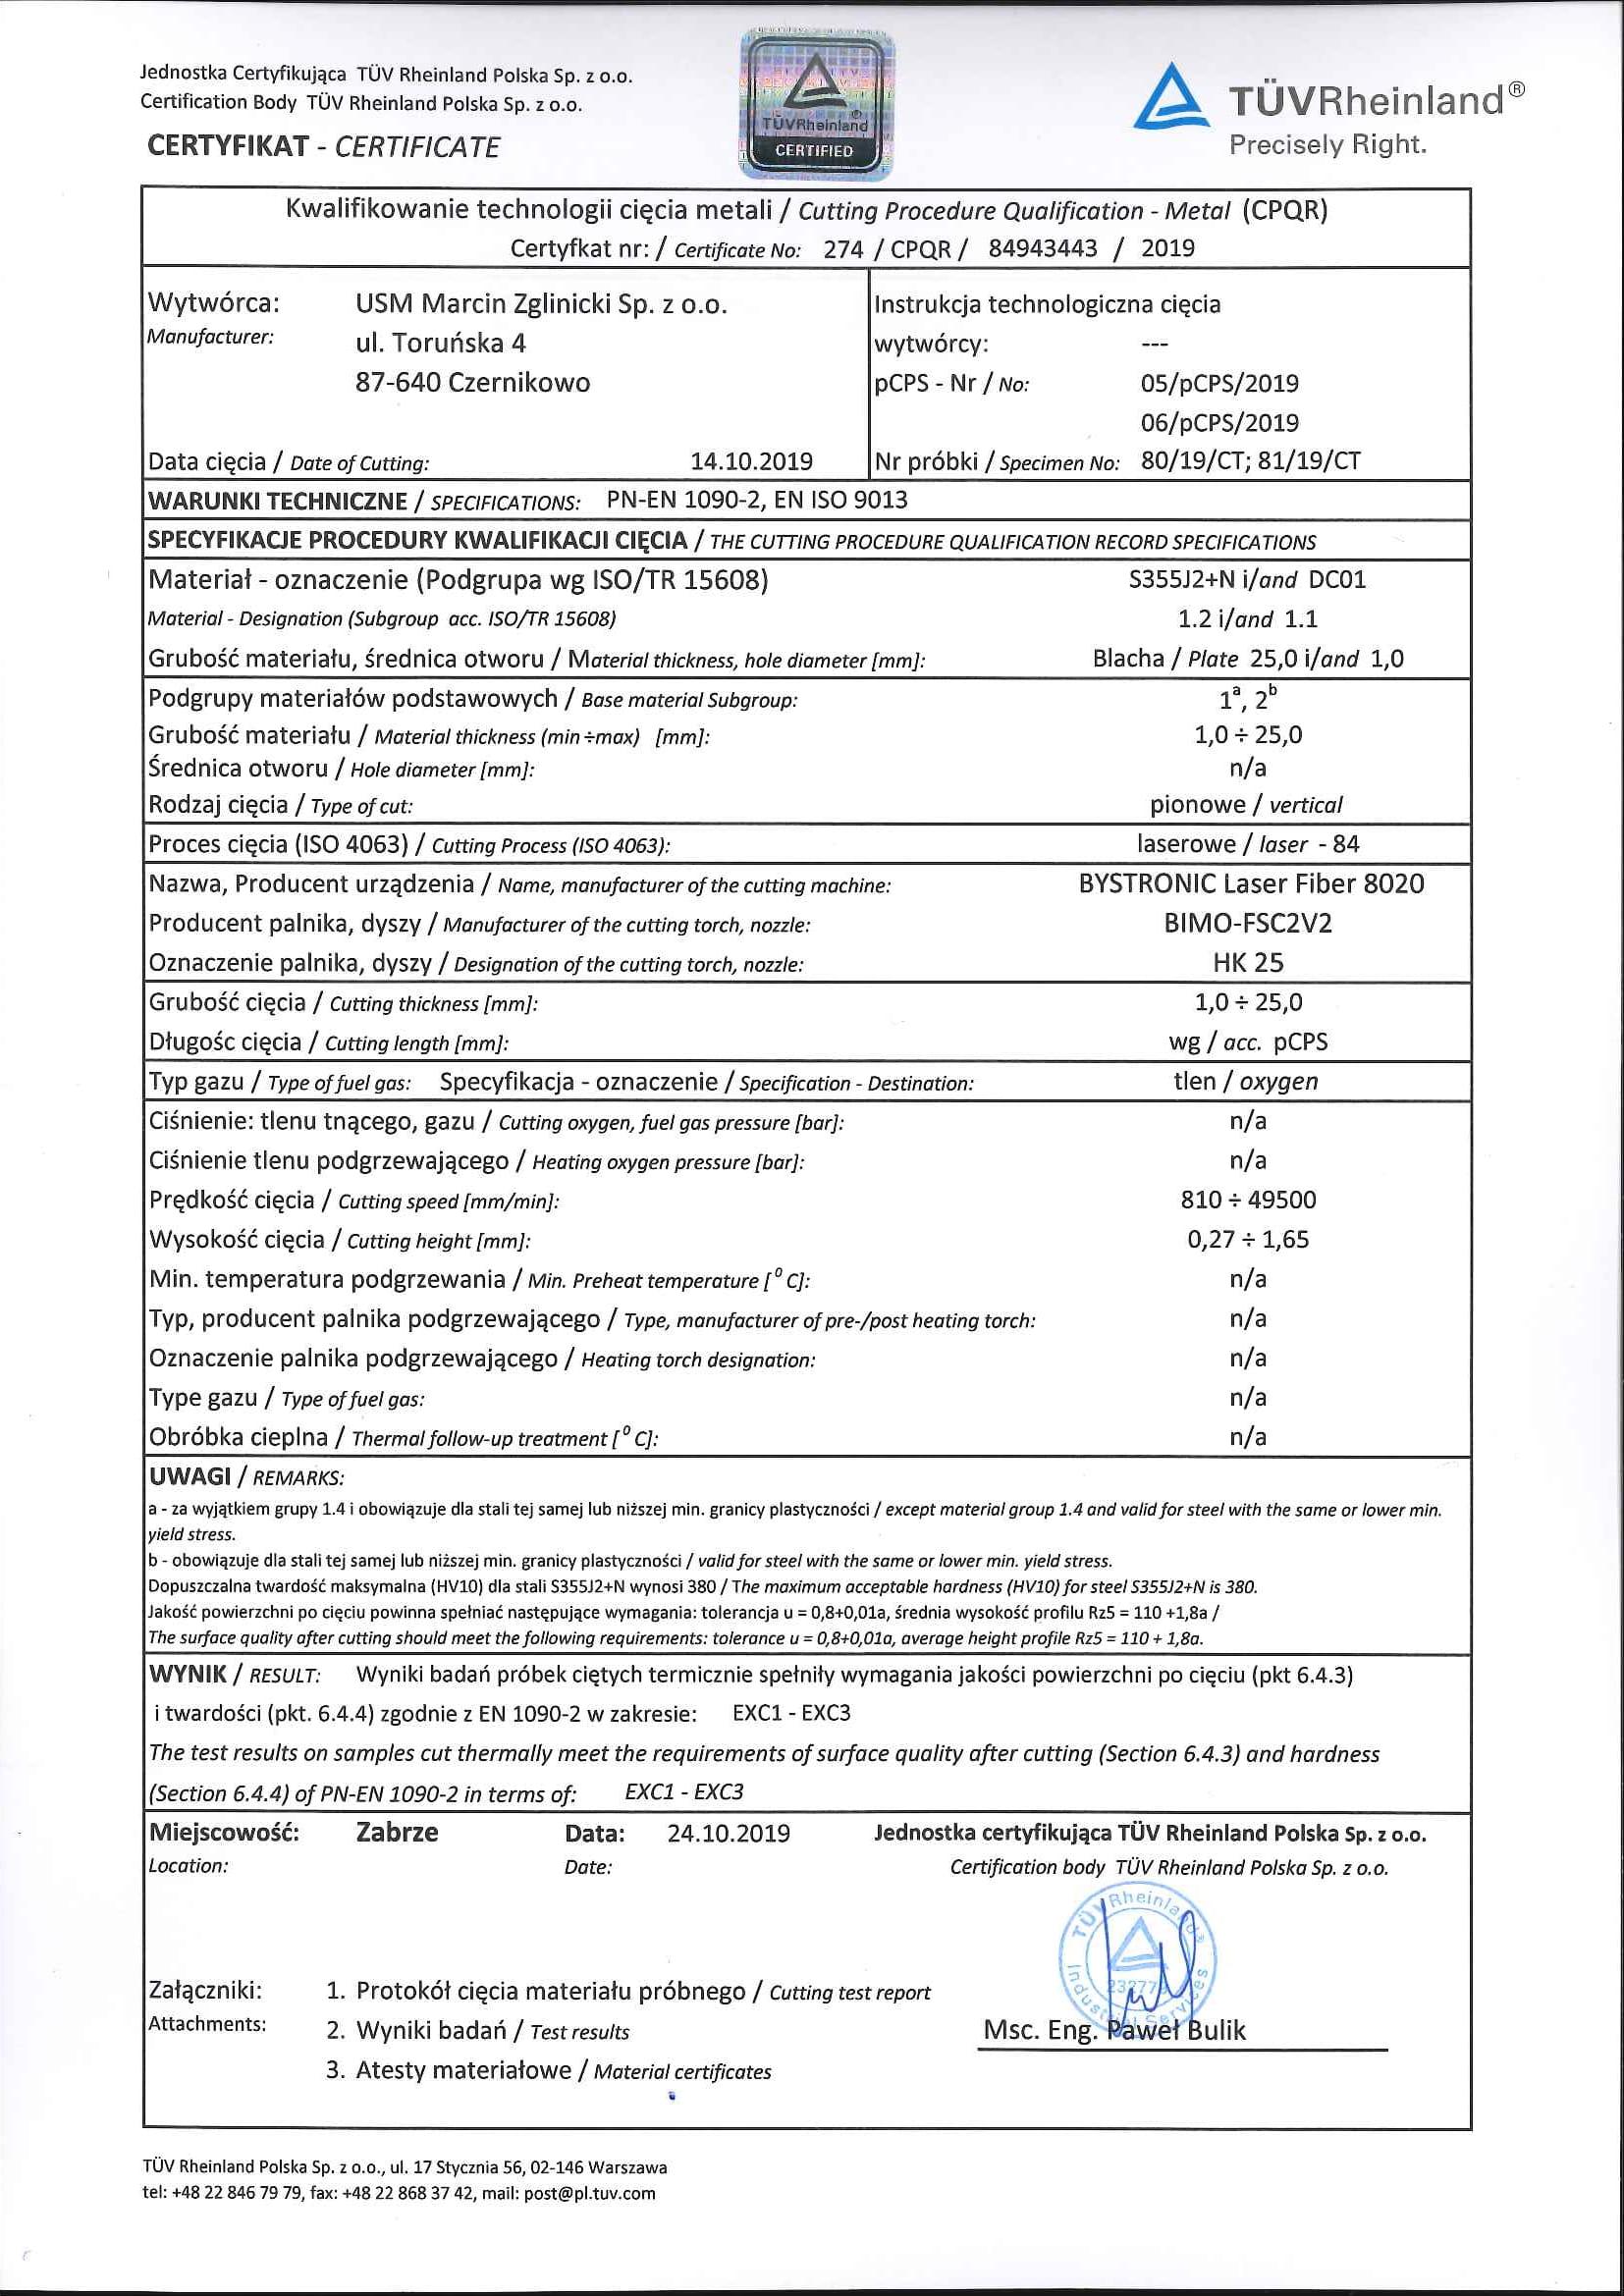 Certyfikat 274 - Technologie Cięcia Metali